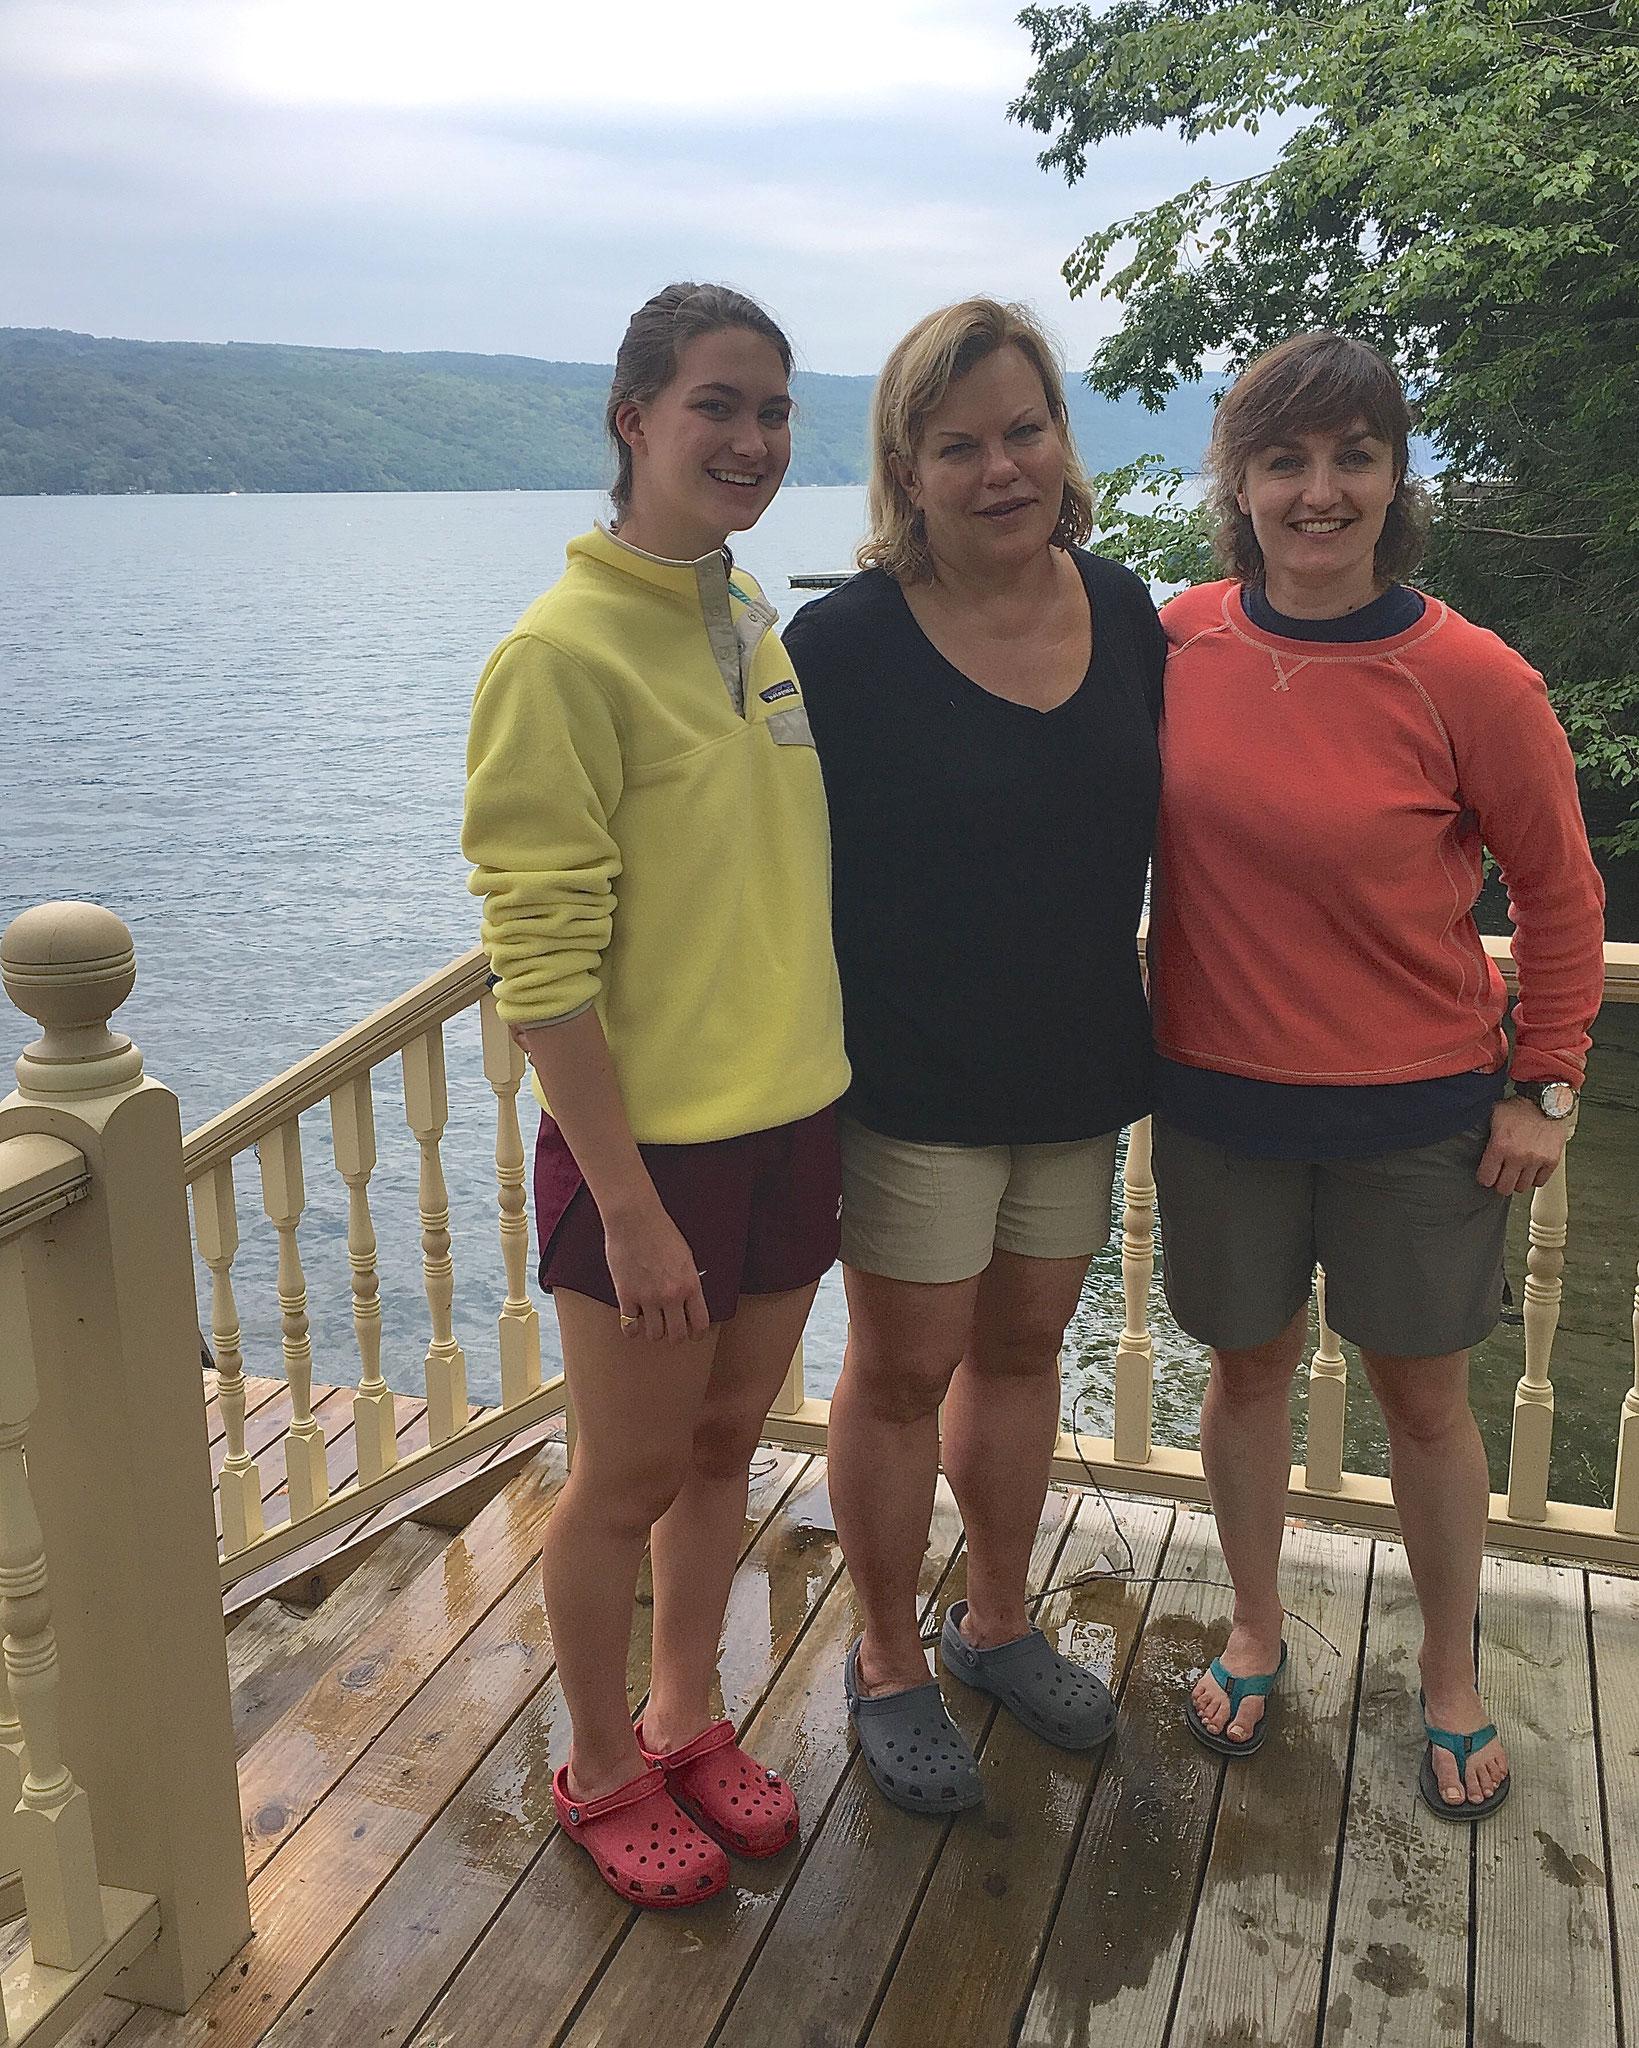 Ellie, Celeste, & Wendy (Barner)  7-2017 Skaneateles